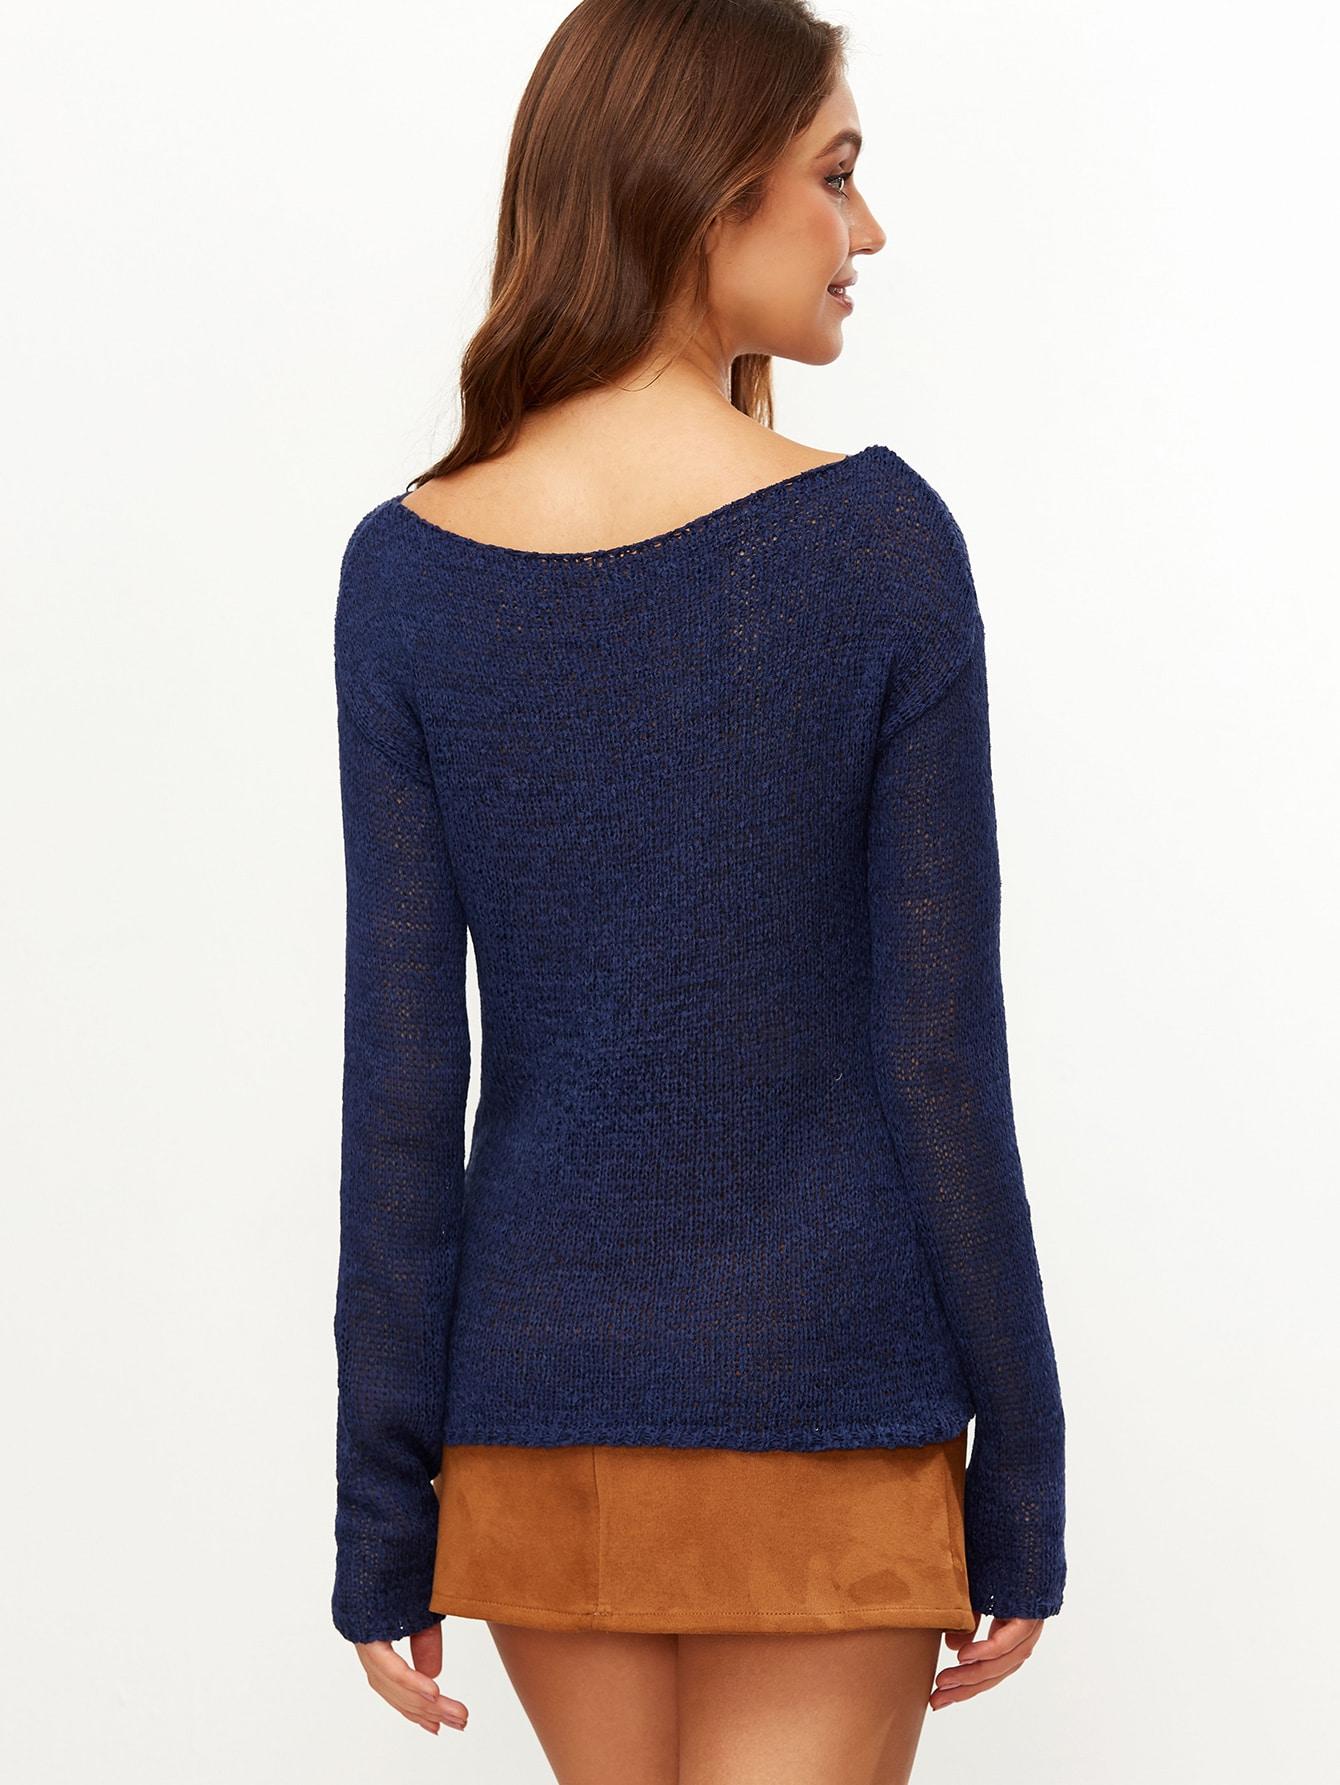 sweater161109401_2